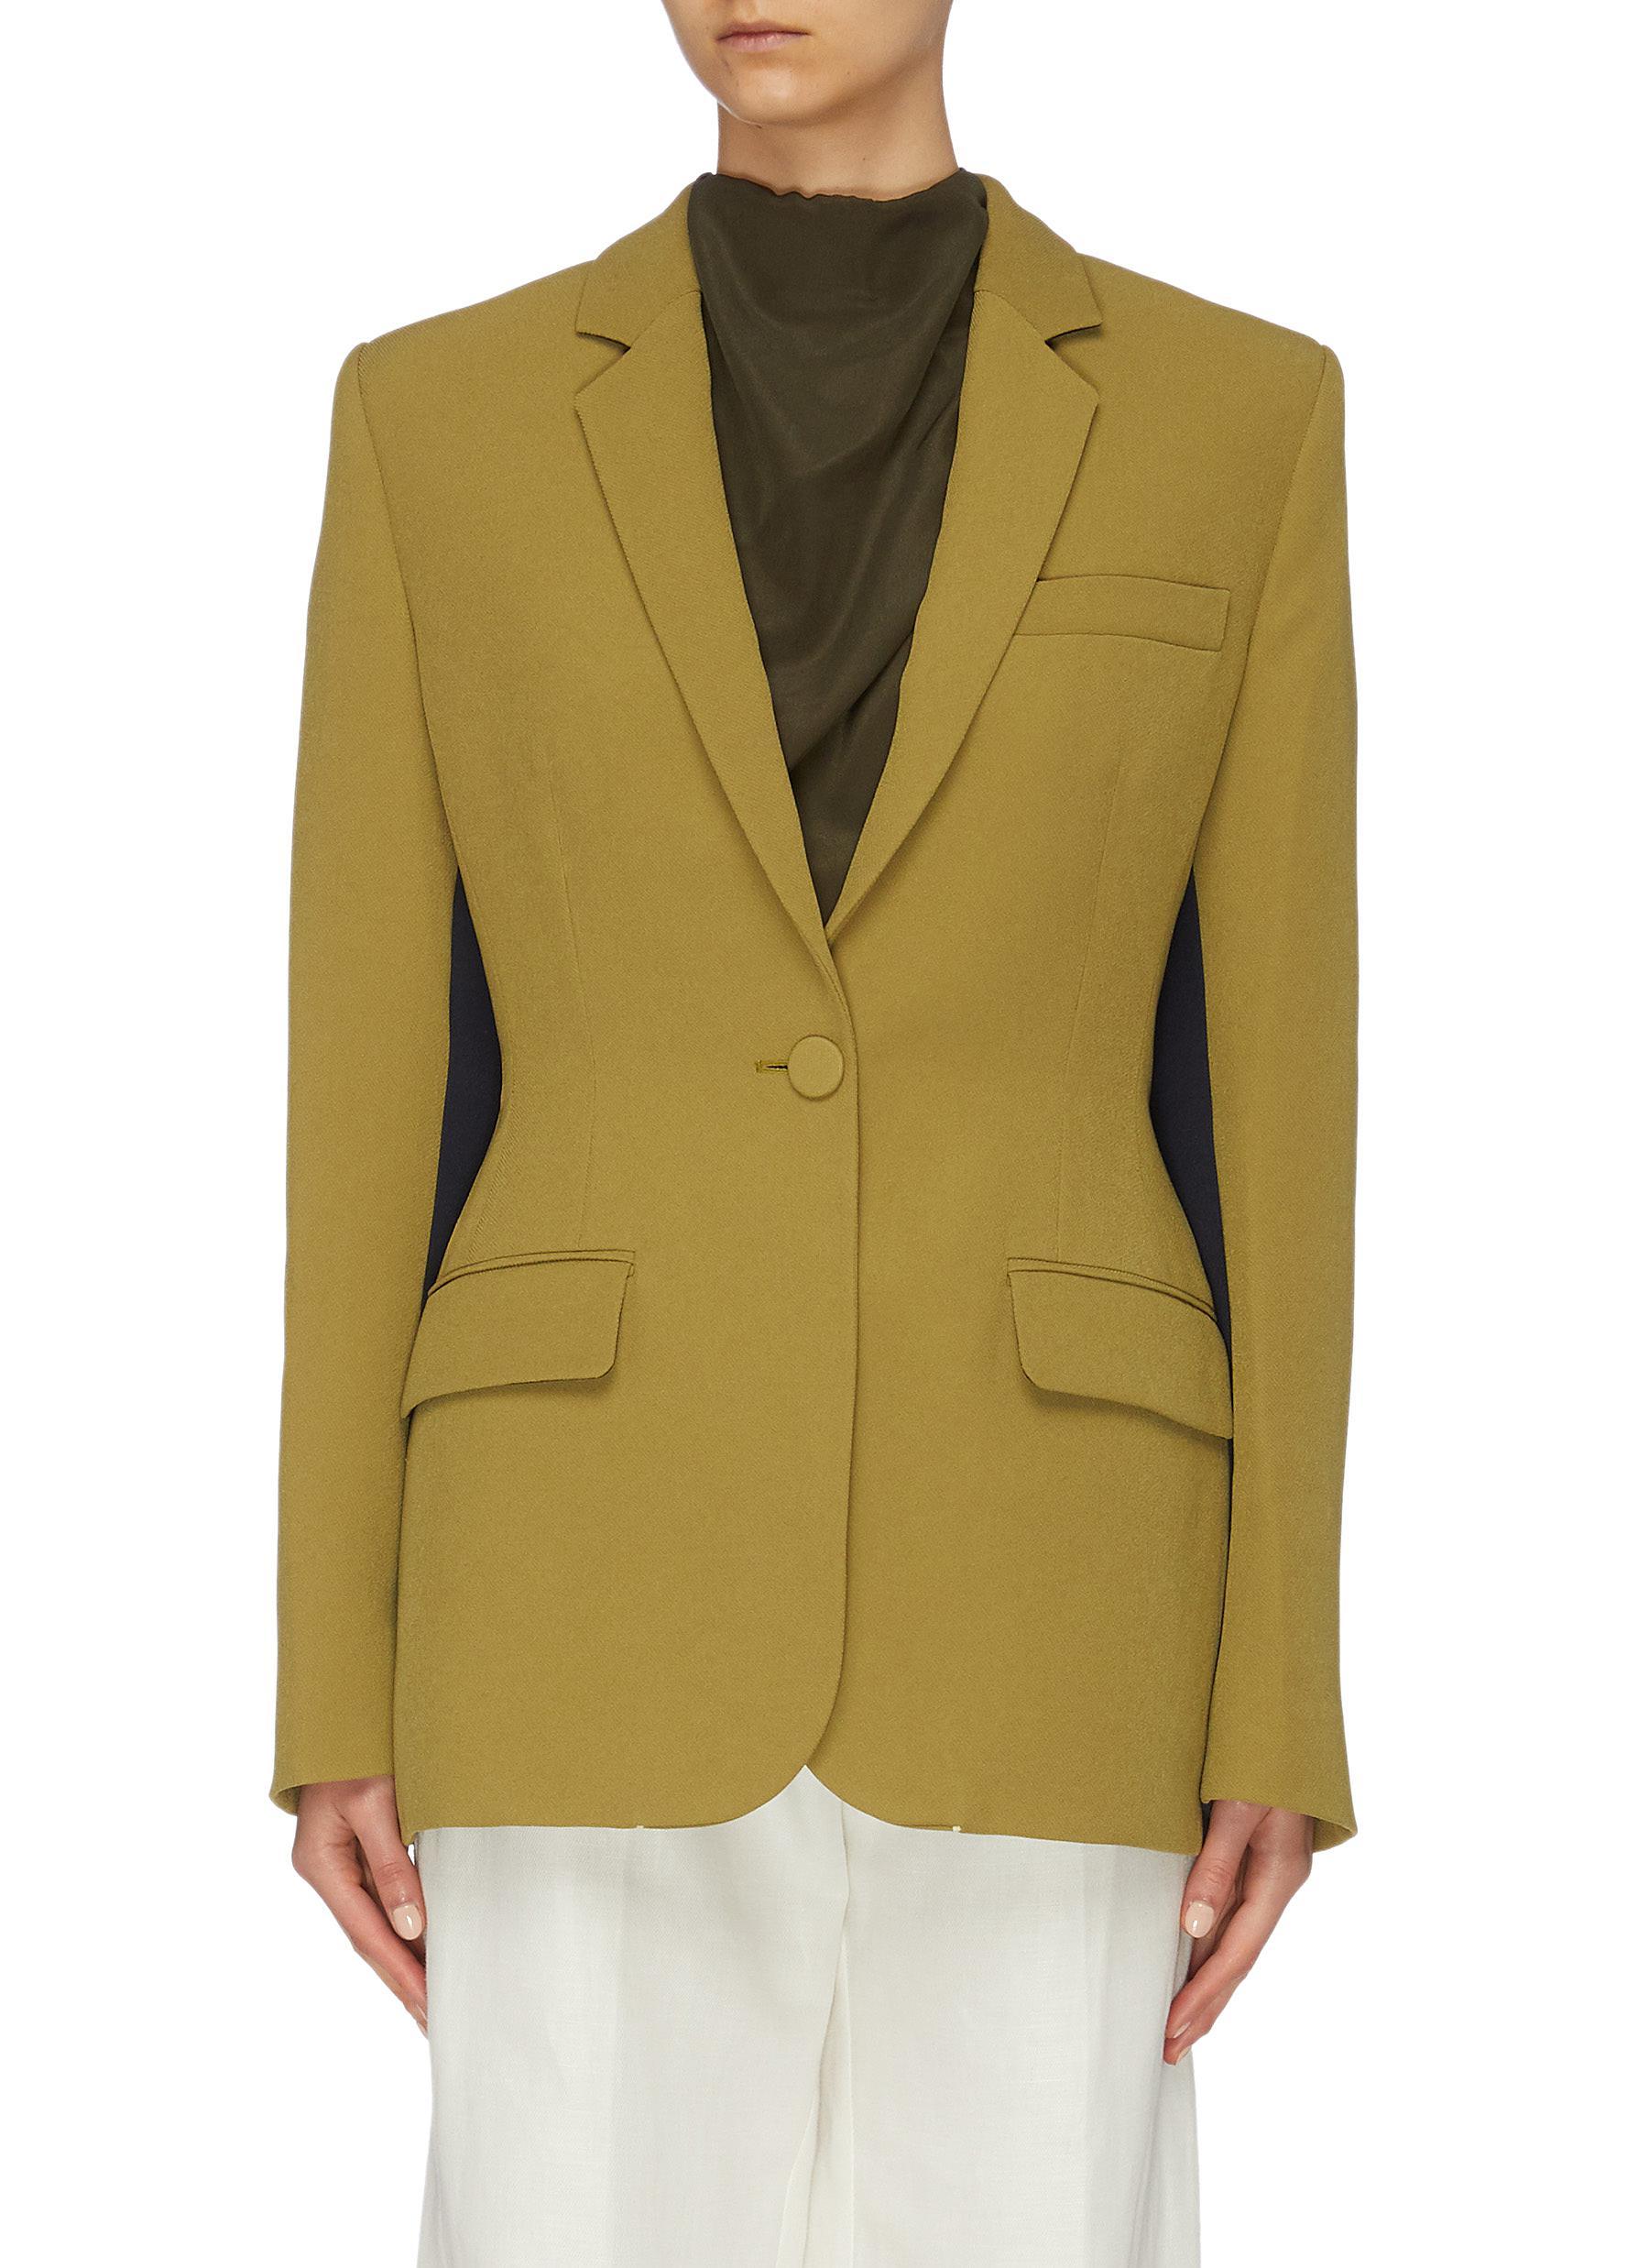 Akira colourblock inseam blazer by Roksanda